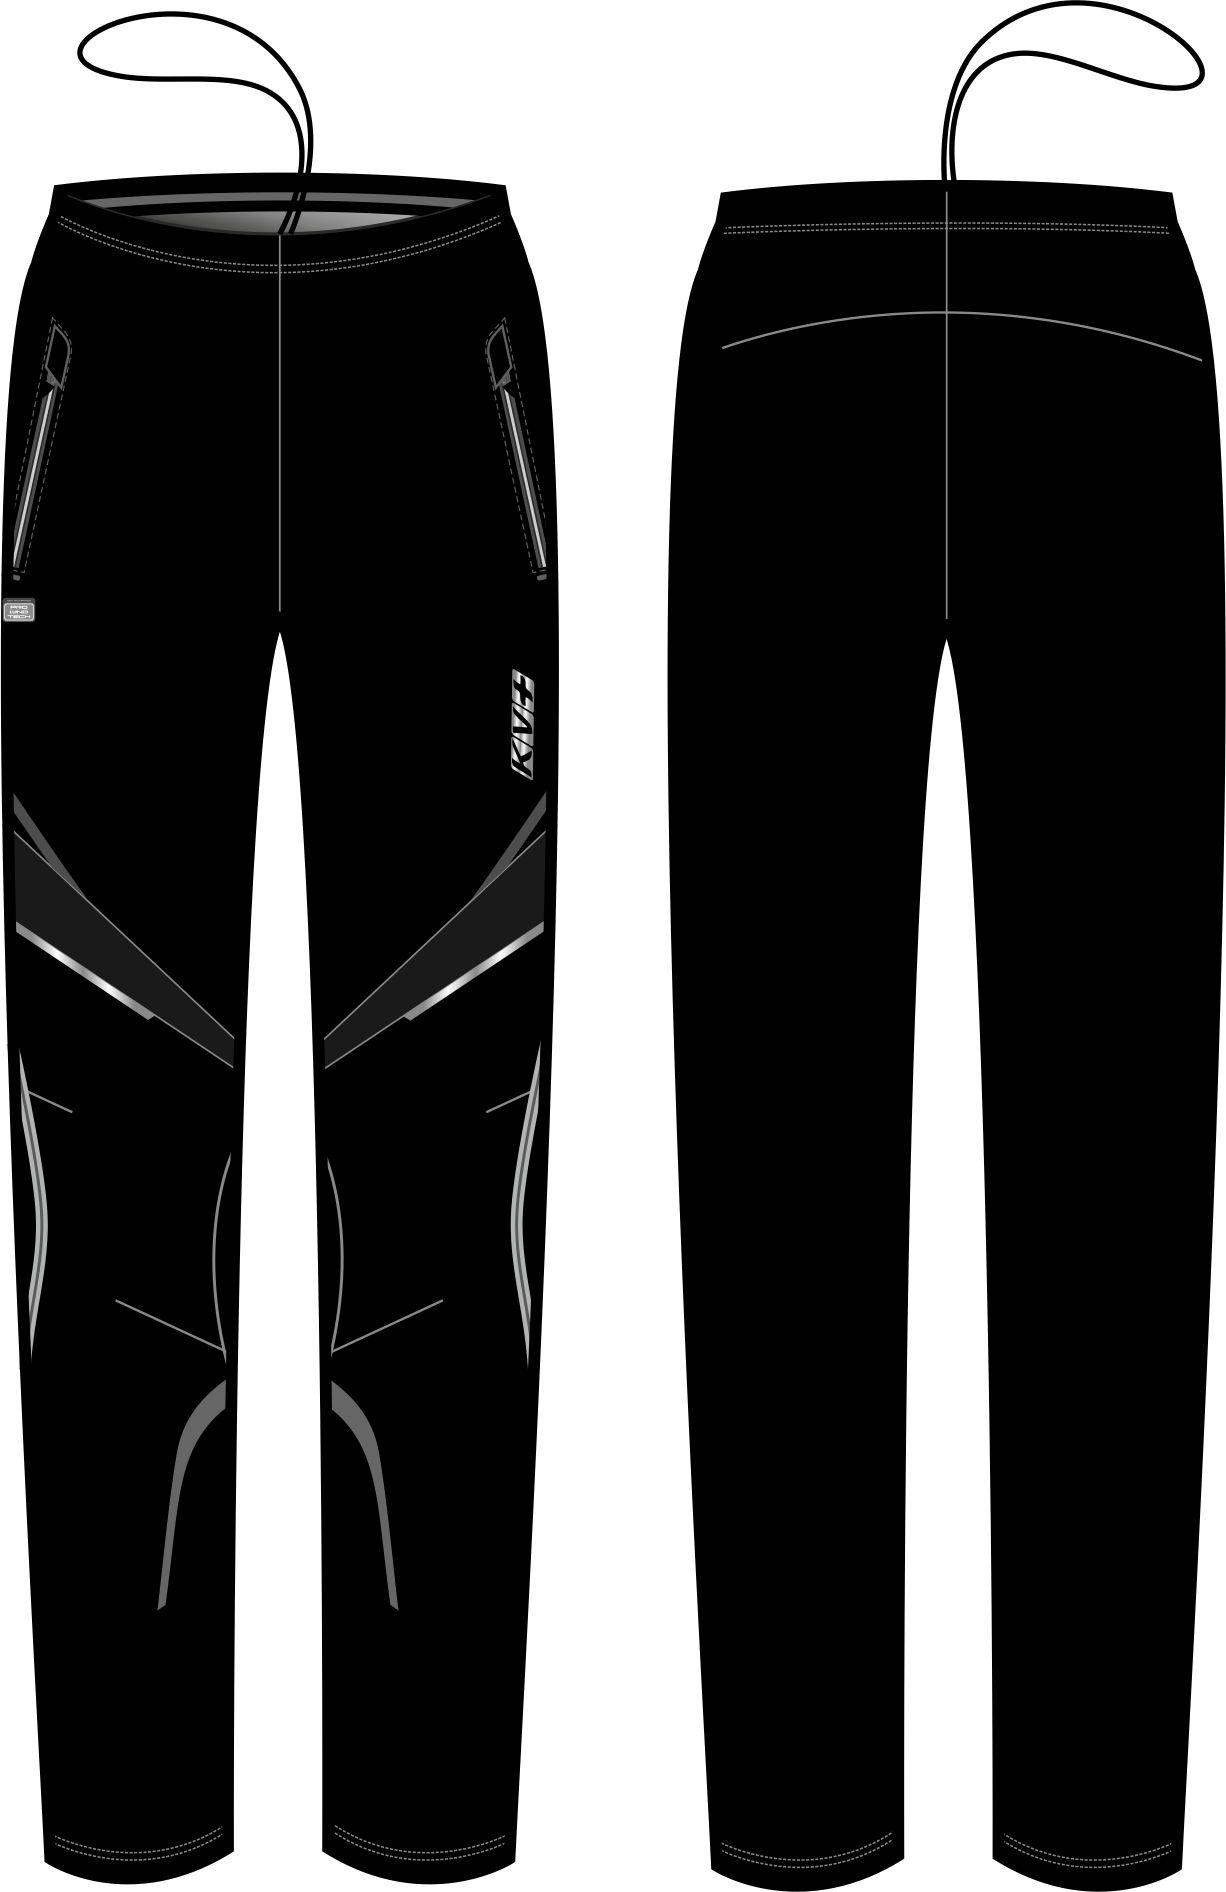 DAVOS PANTS UNISEX full side zip (black)